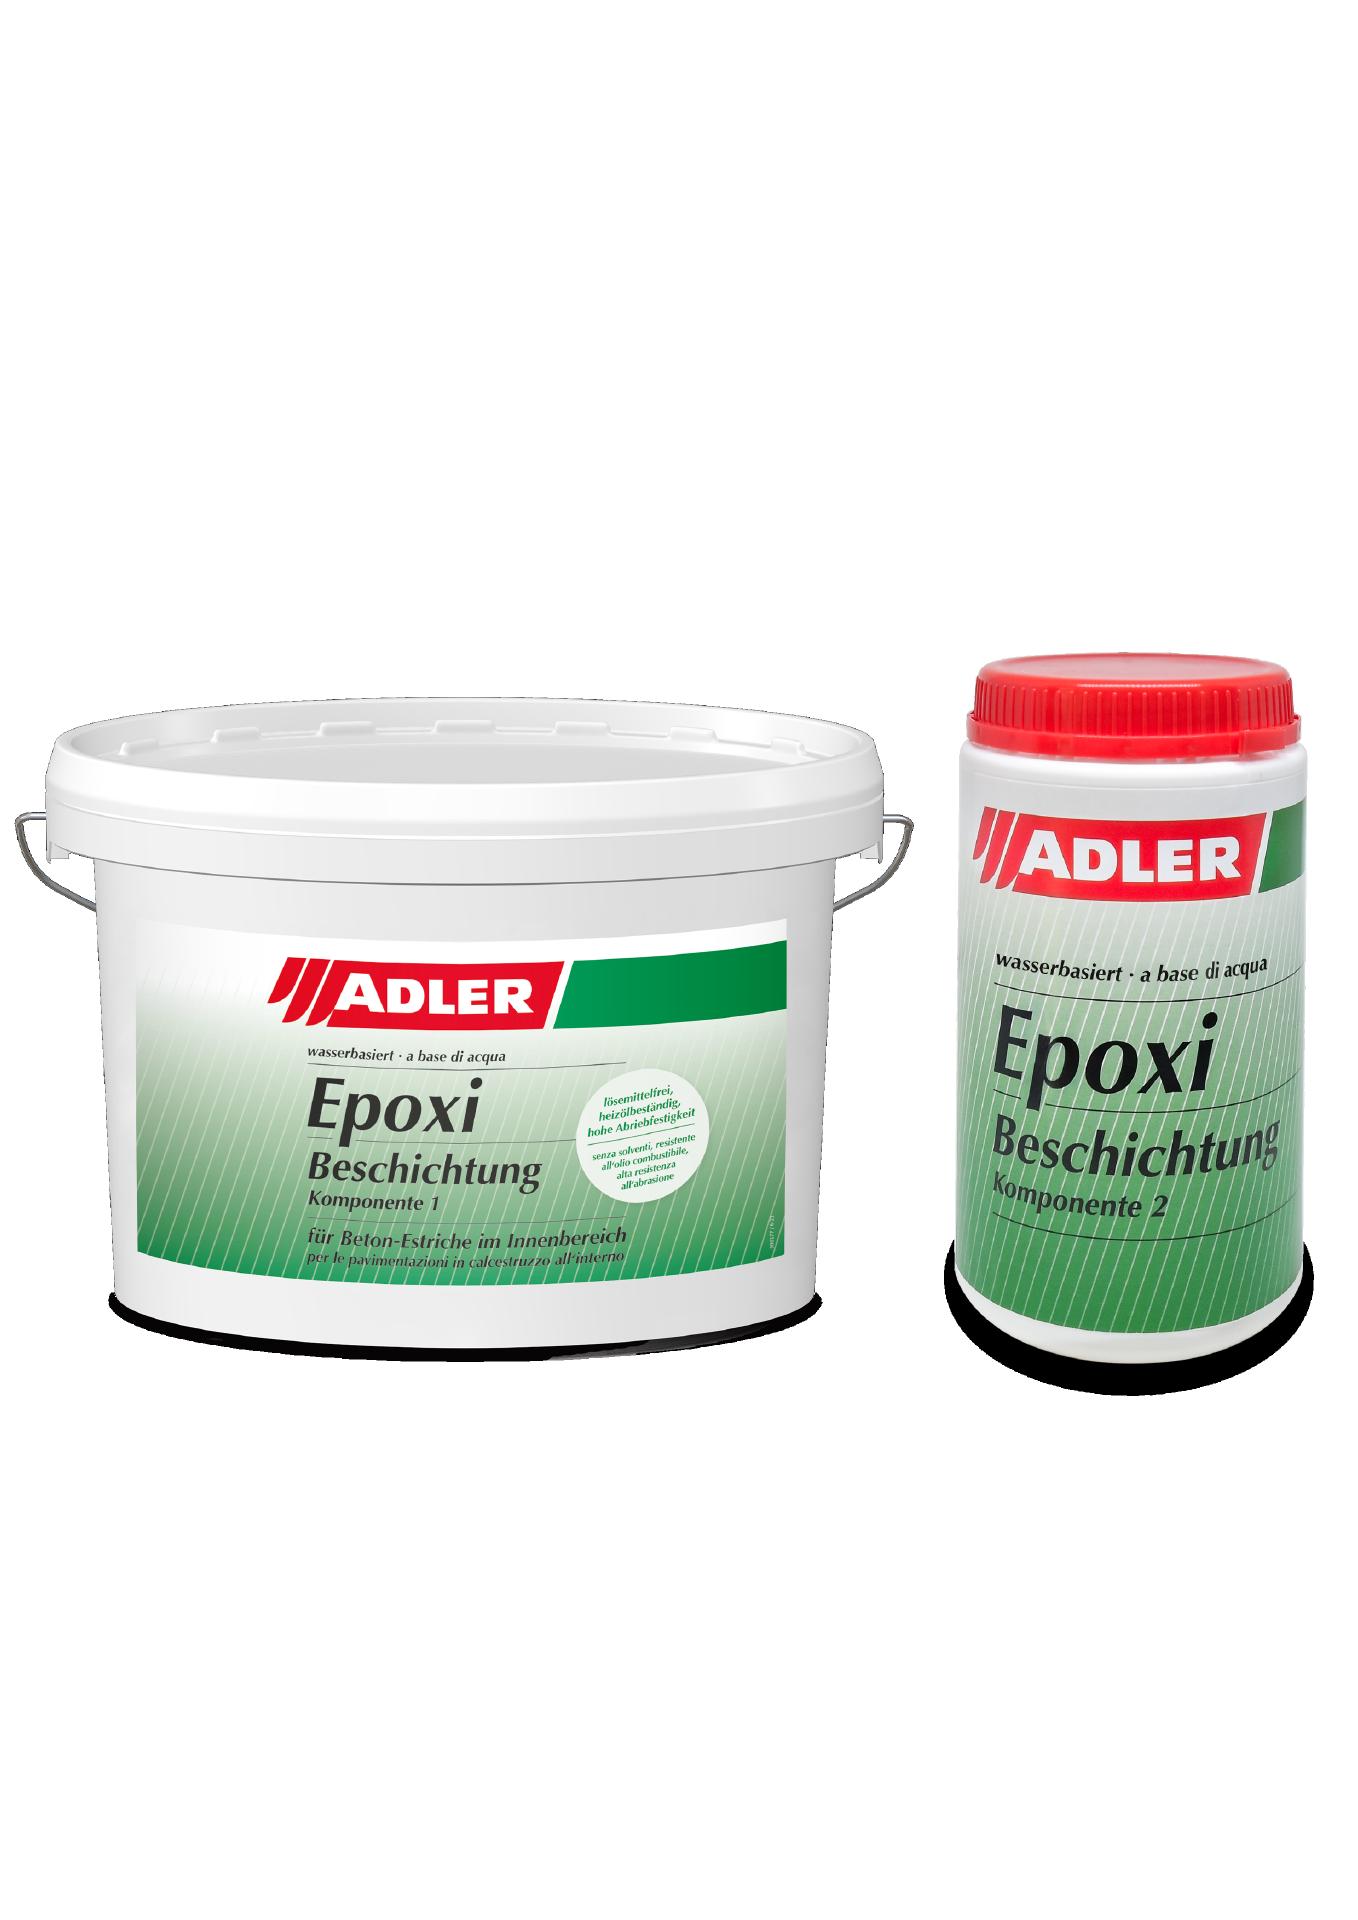 2K-Epoxi-Beschichtung Kieselgrau, Komponente I 3kg